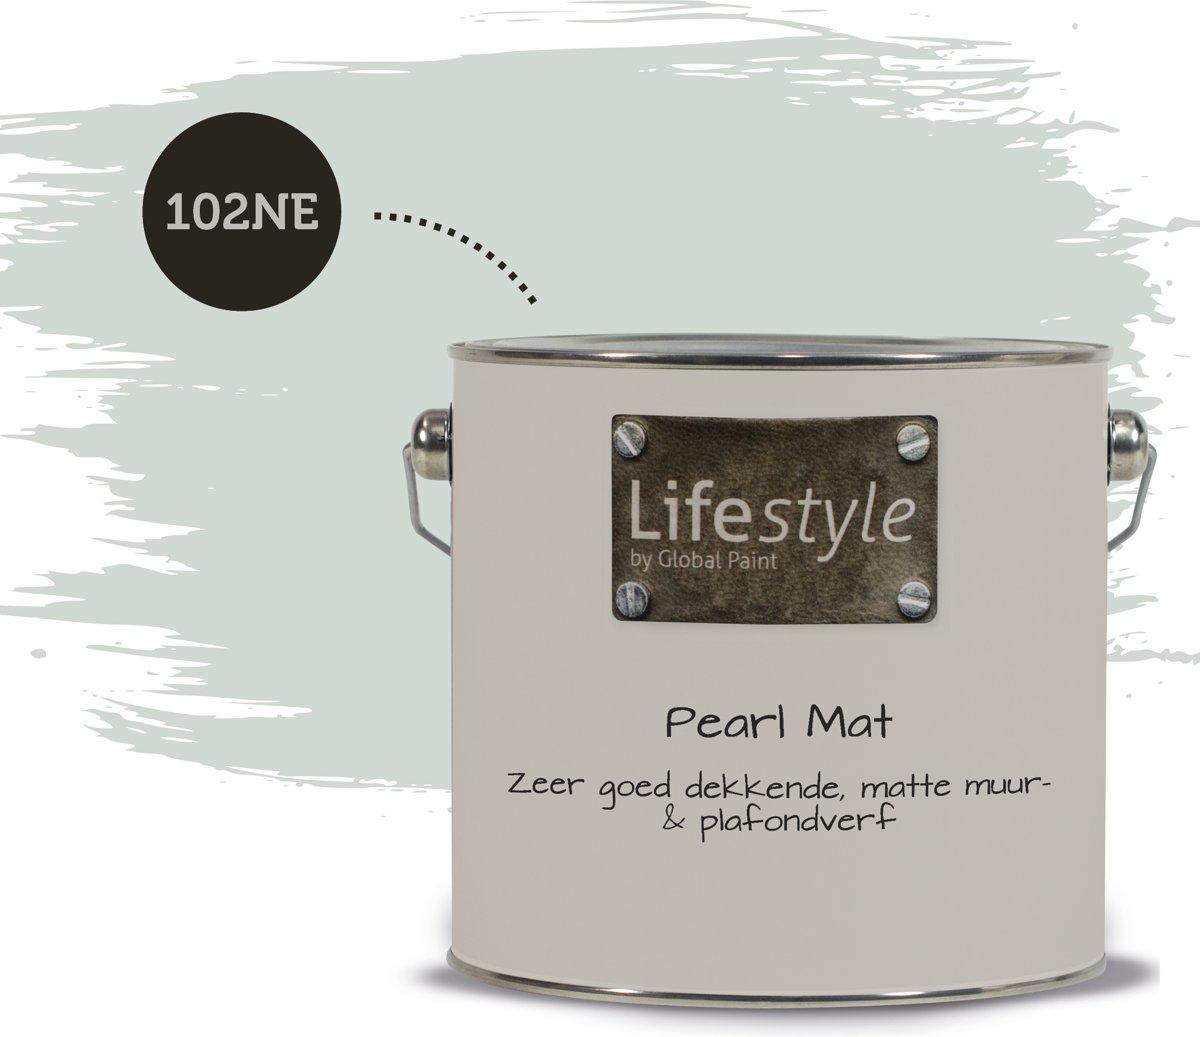 Lifestyle Pearl Mat - Extra reinigbare muurverf - 102NE - 2.5 liter kopen